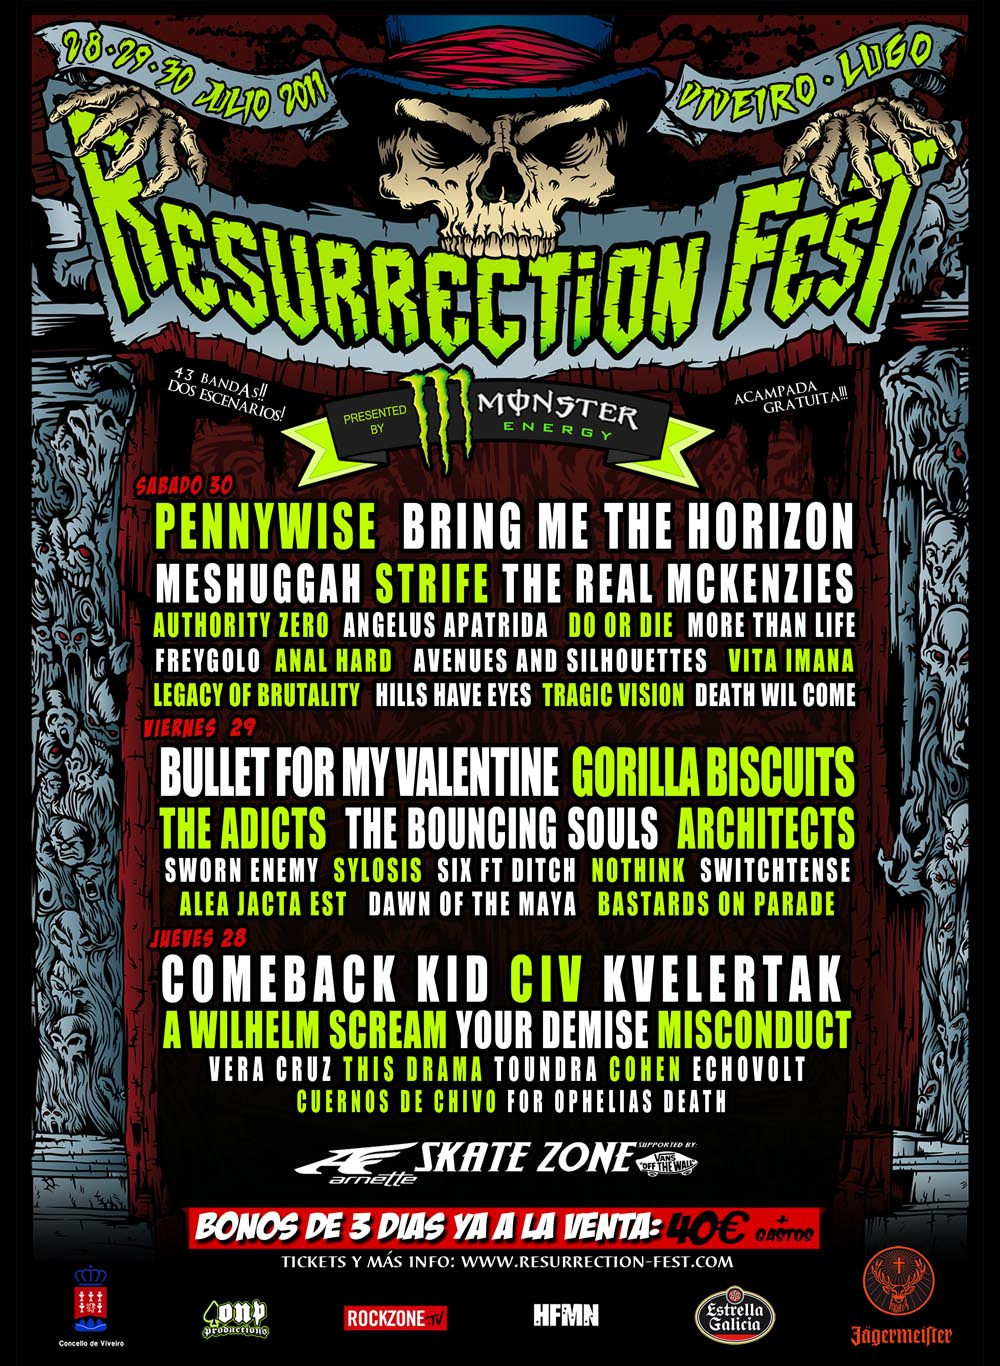 Resurrection Fest 2011 Cartel3